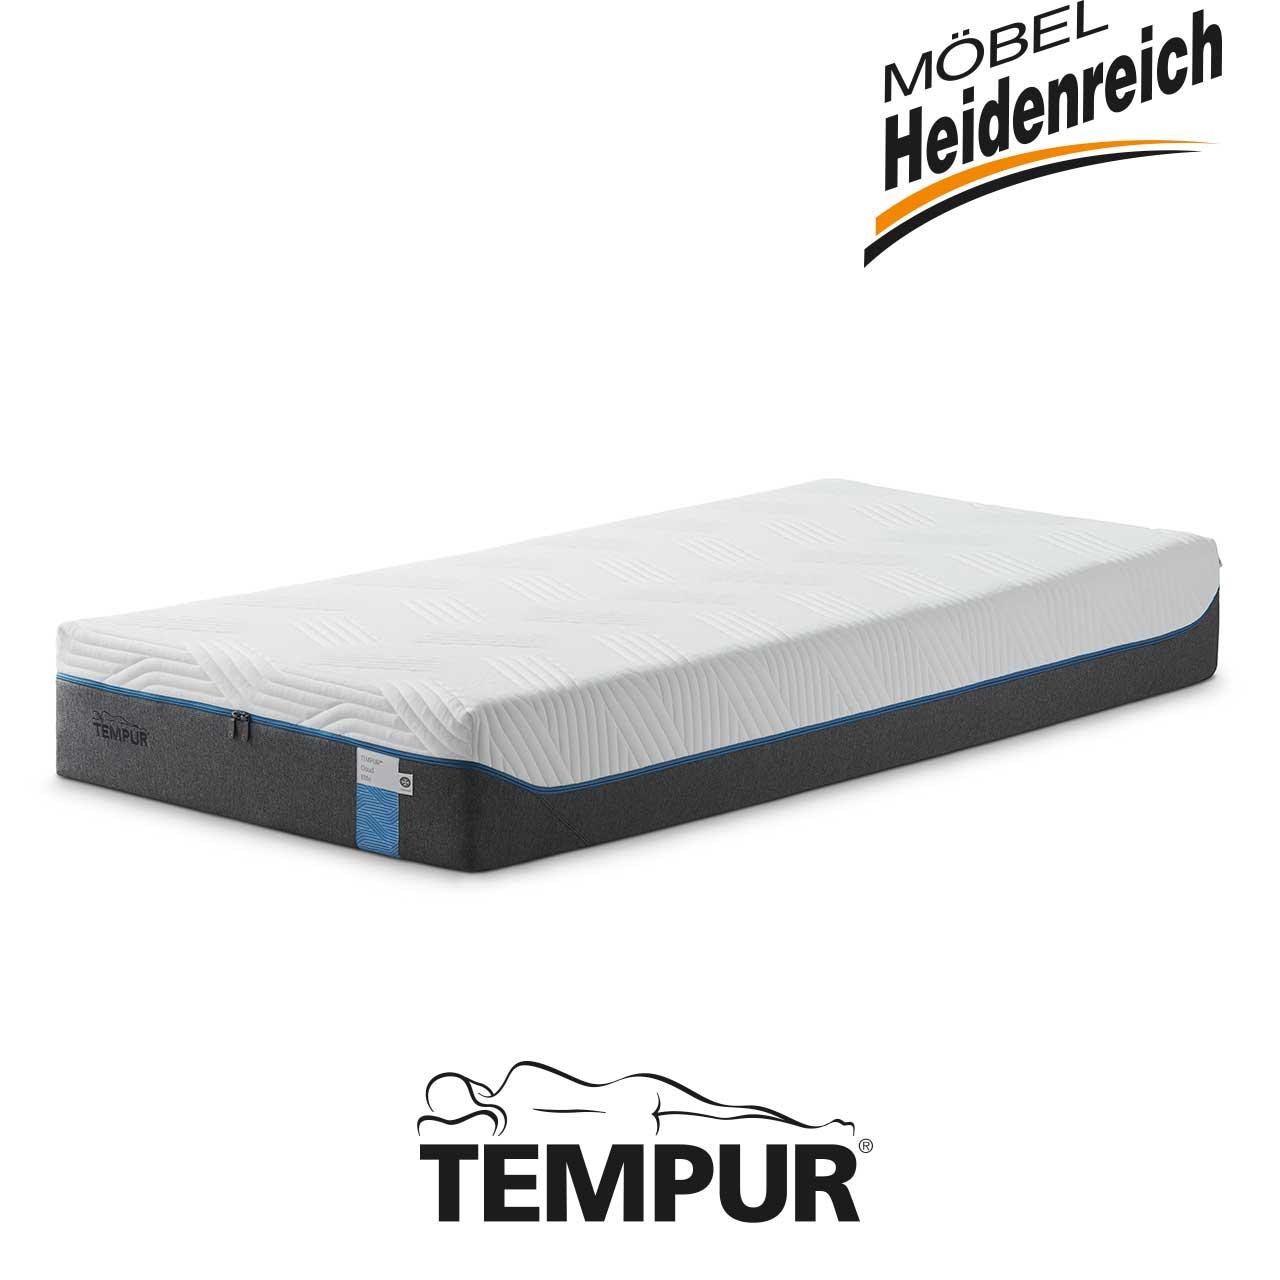 0aecf1eb84d36e Tempur Matratze Sensation 25 zum Sonderpreis